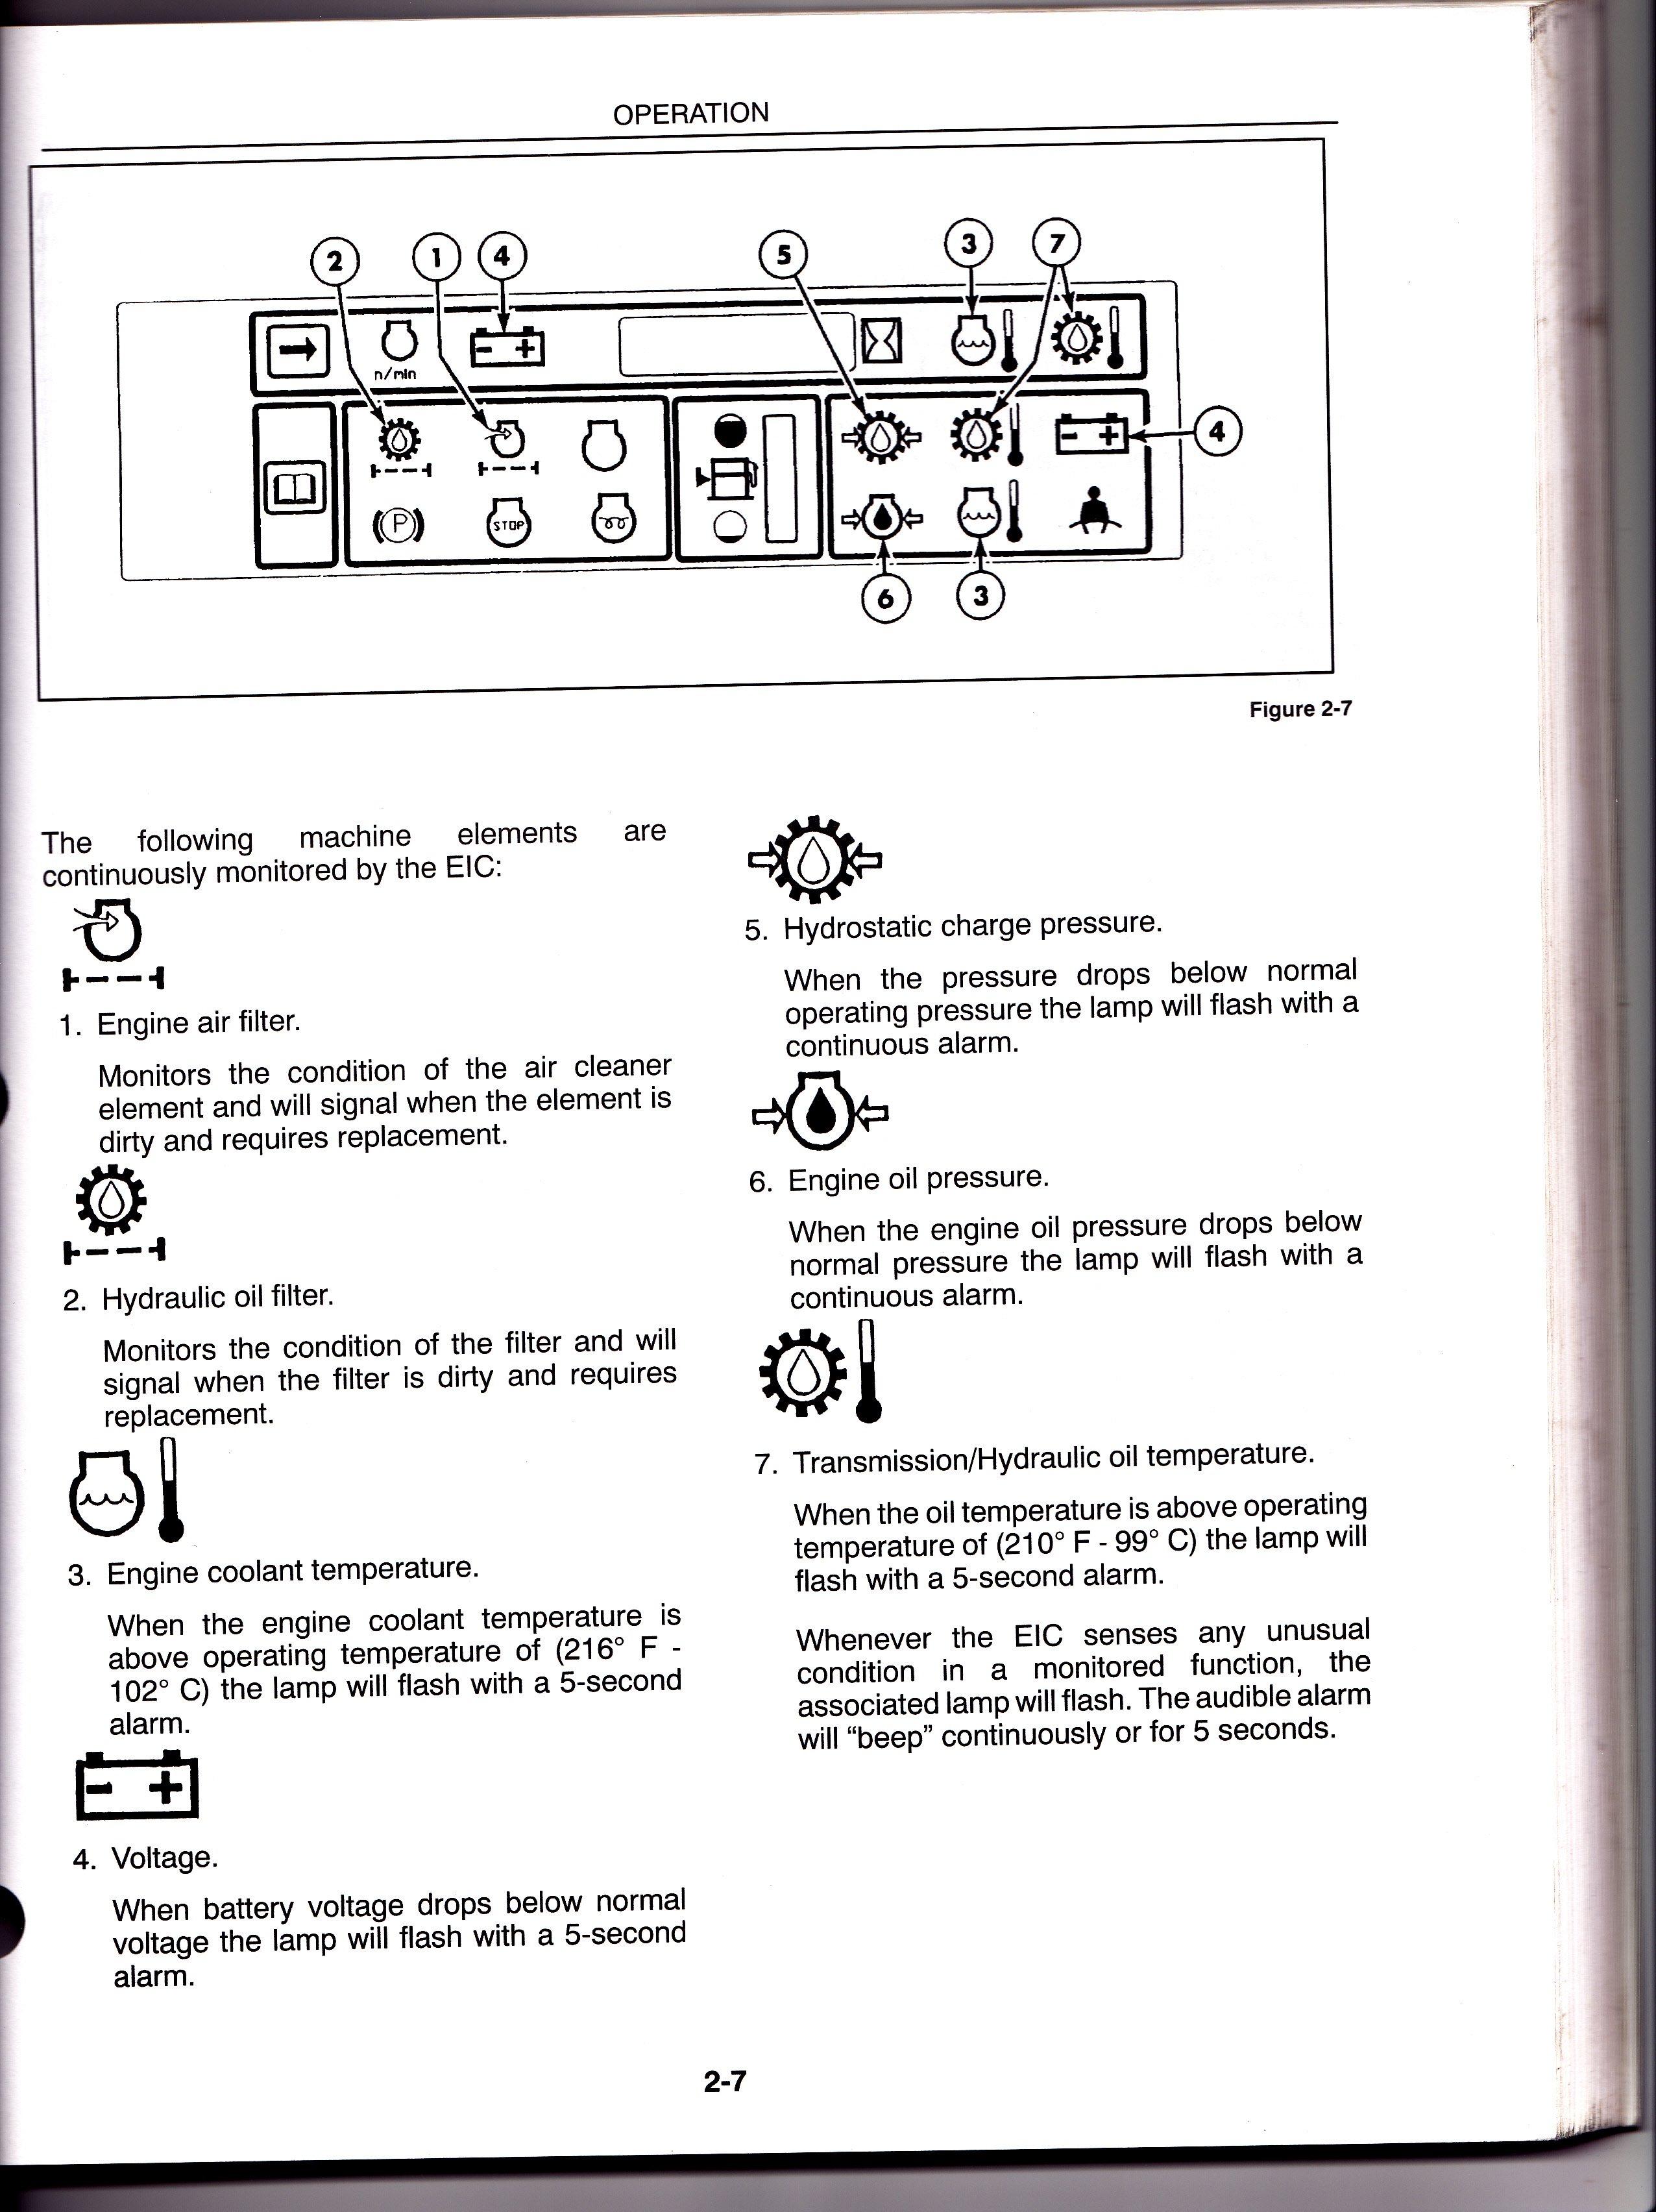 2015 isuzu npr owners manual